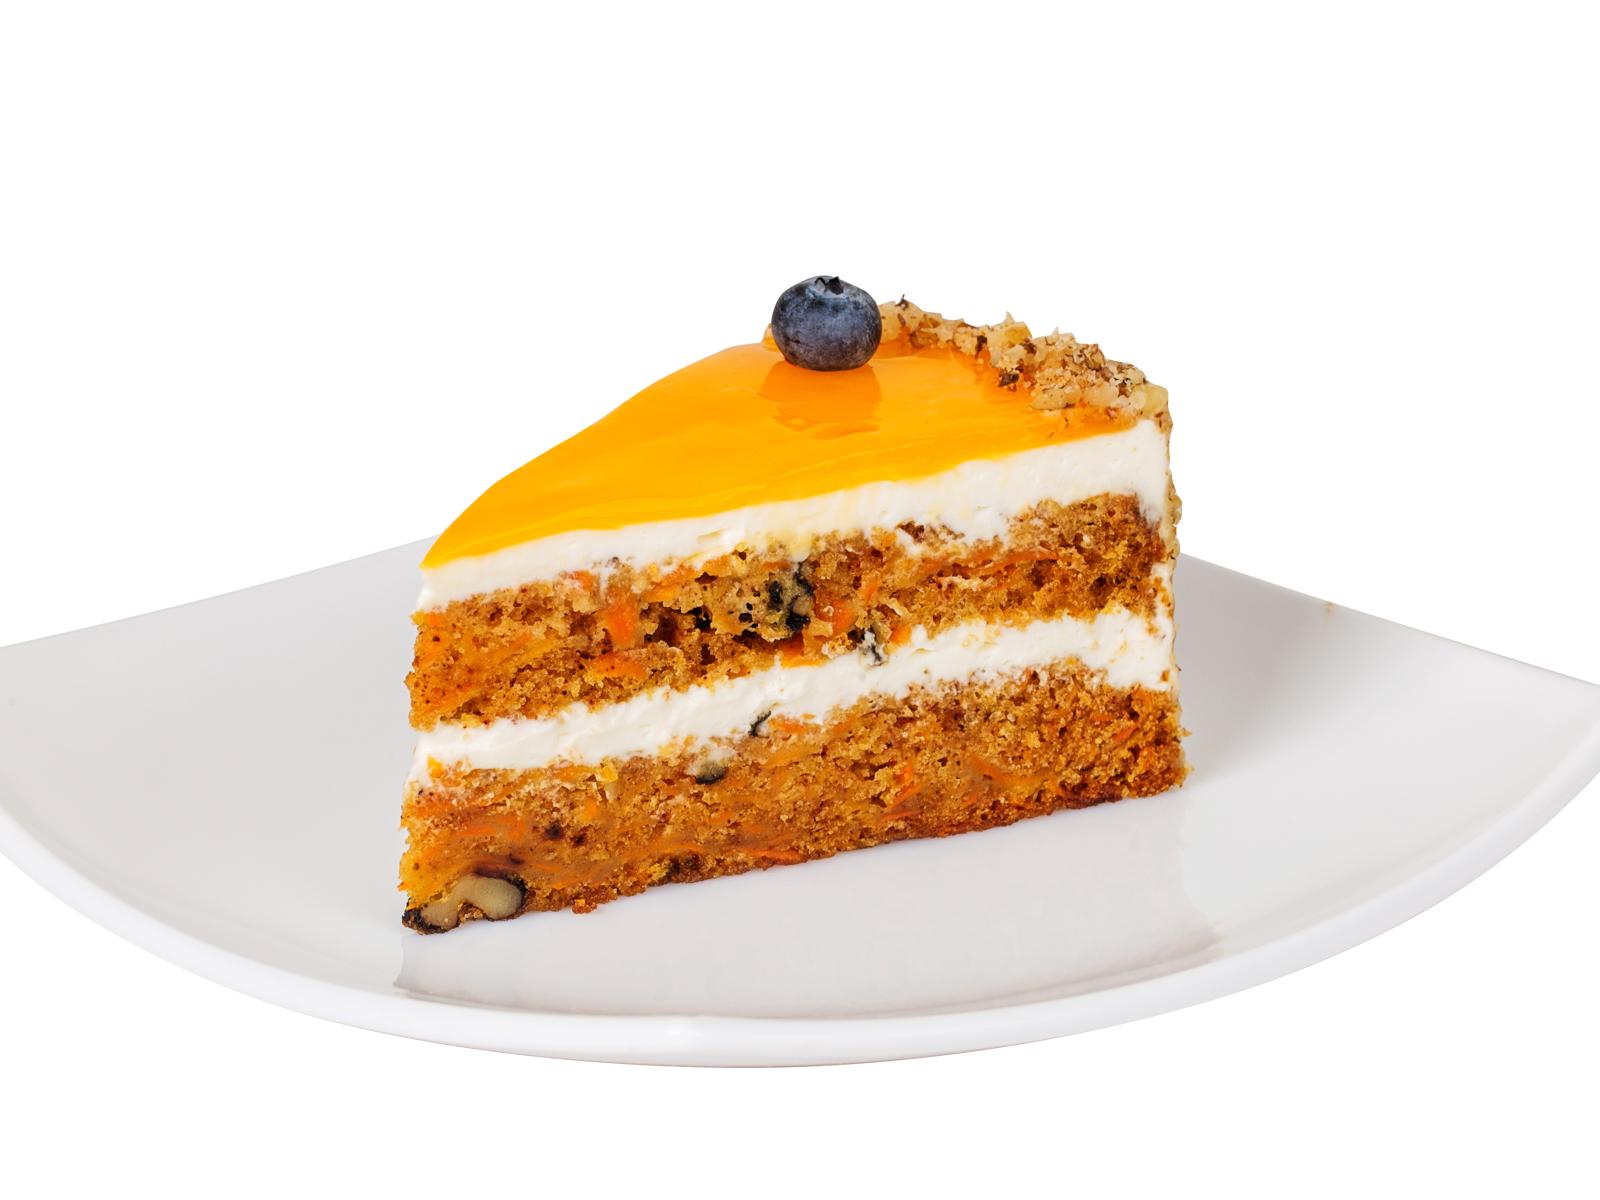 Порция Морковного торта с грецким орехом